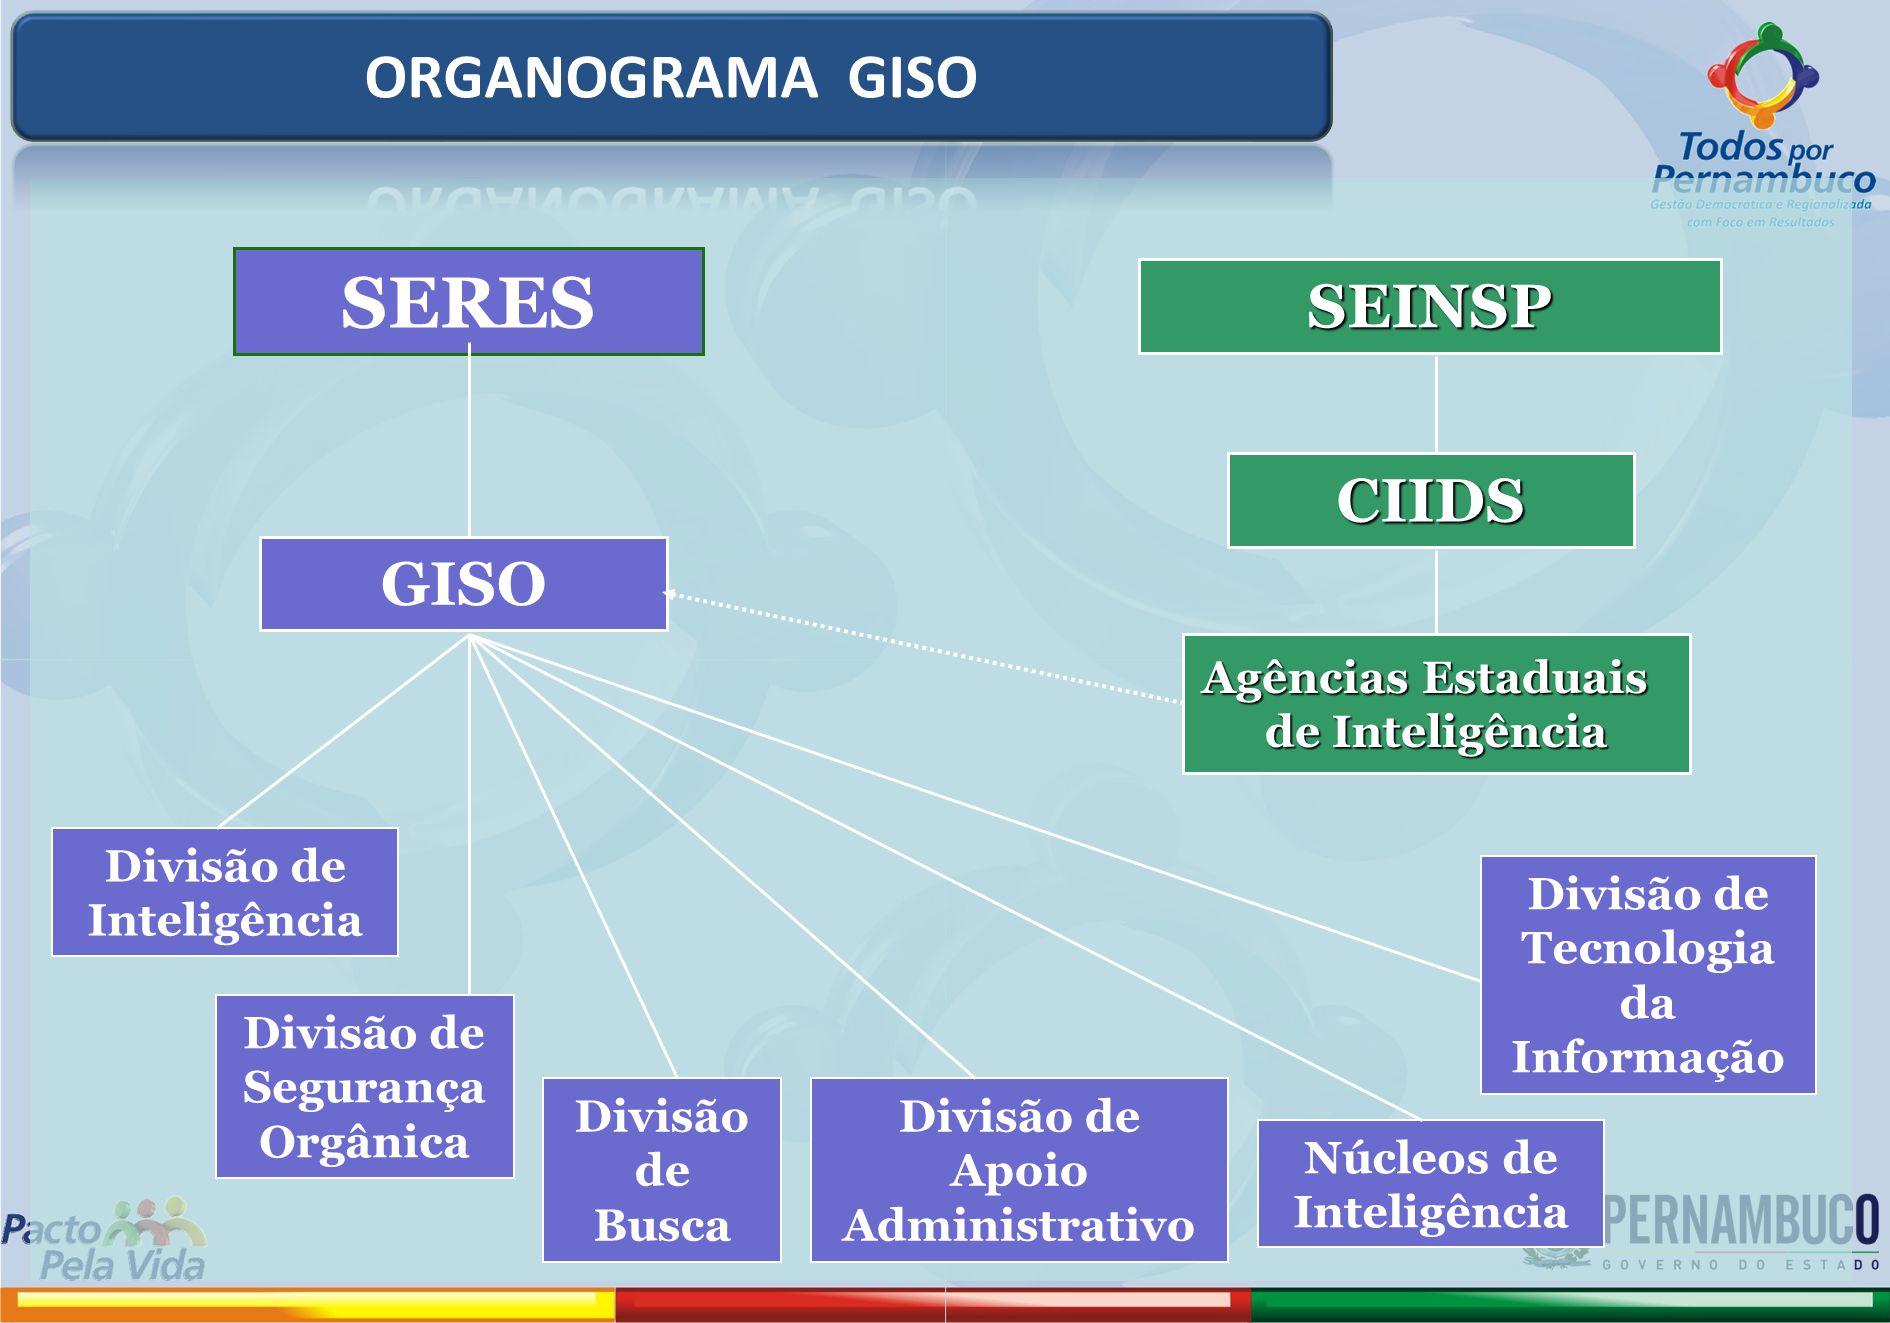 SERES SEINSP GISOCIIDS Agências Estaduais de Inteligência Divisão de Inteligência Divisão de Segurança Orgânica Divisão de Busca Divisão de Tecnologia